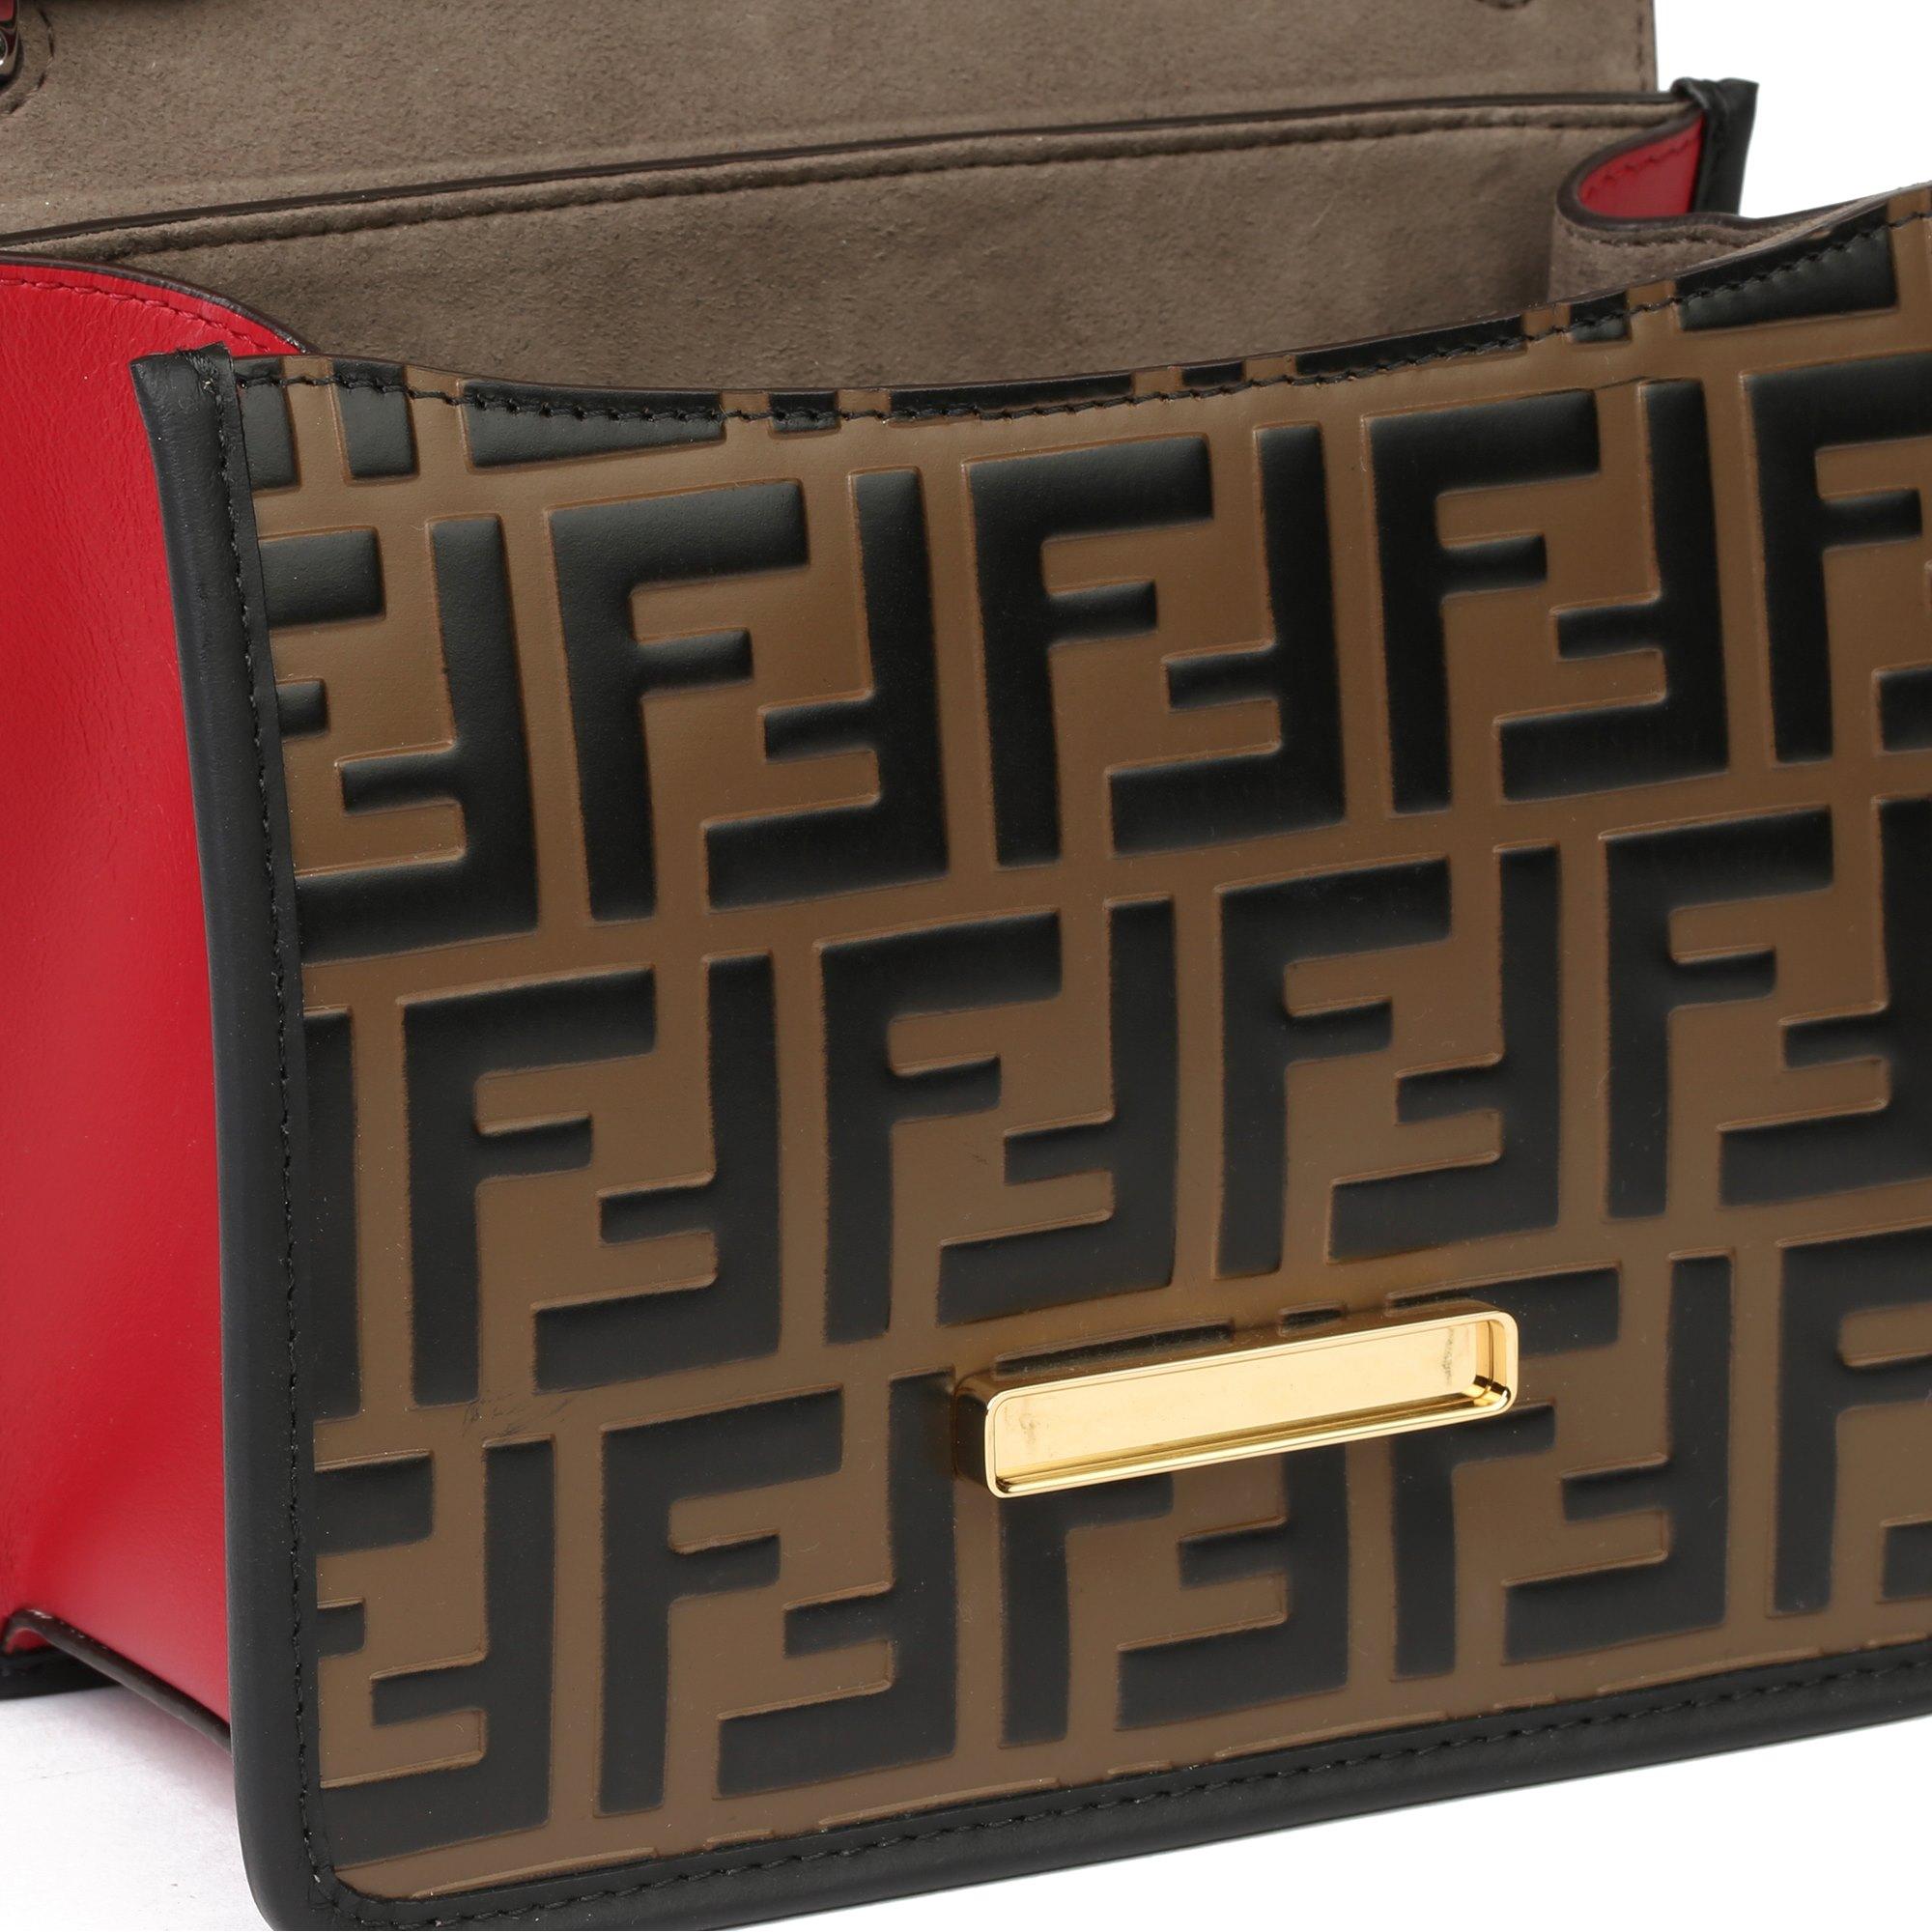 Fendi Red, Brown & Black Smooth Calfskin Leather Kan I